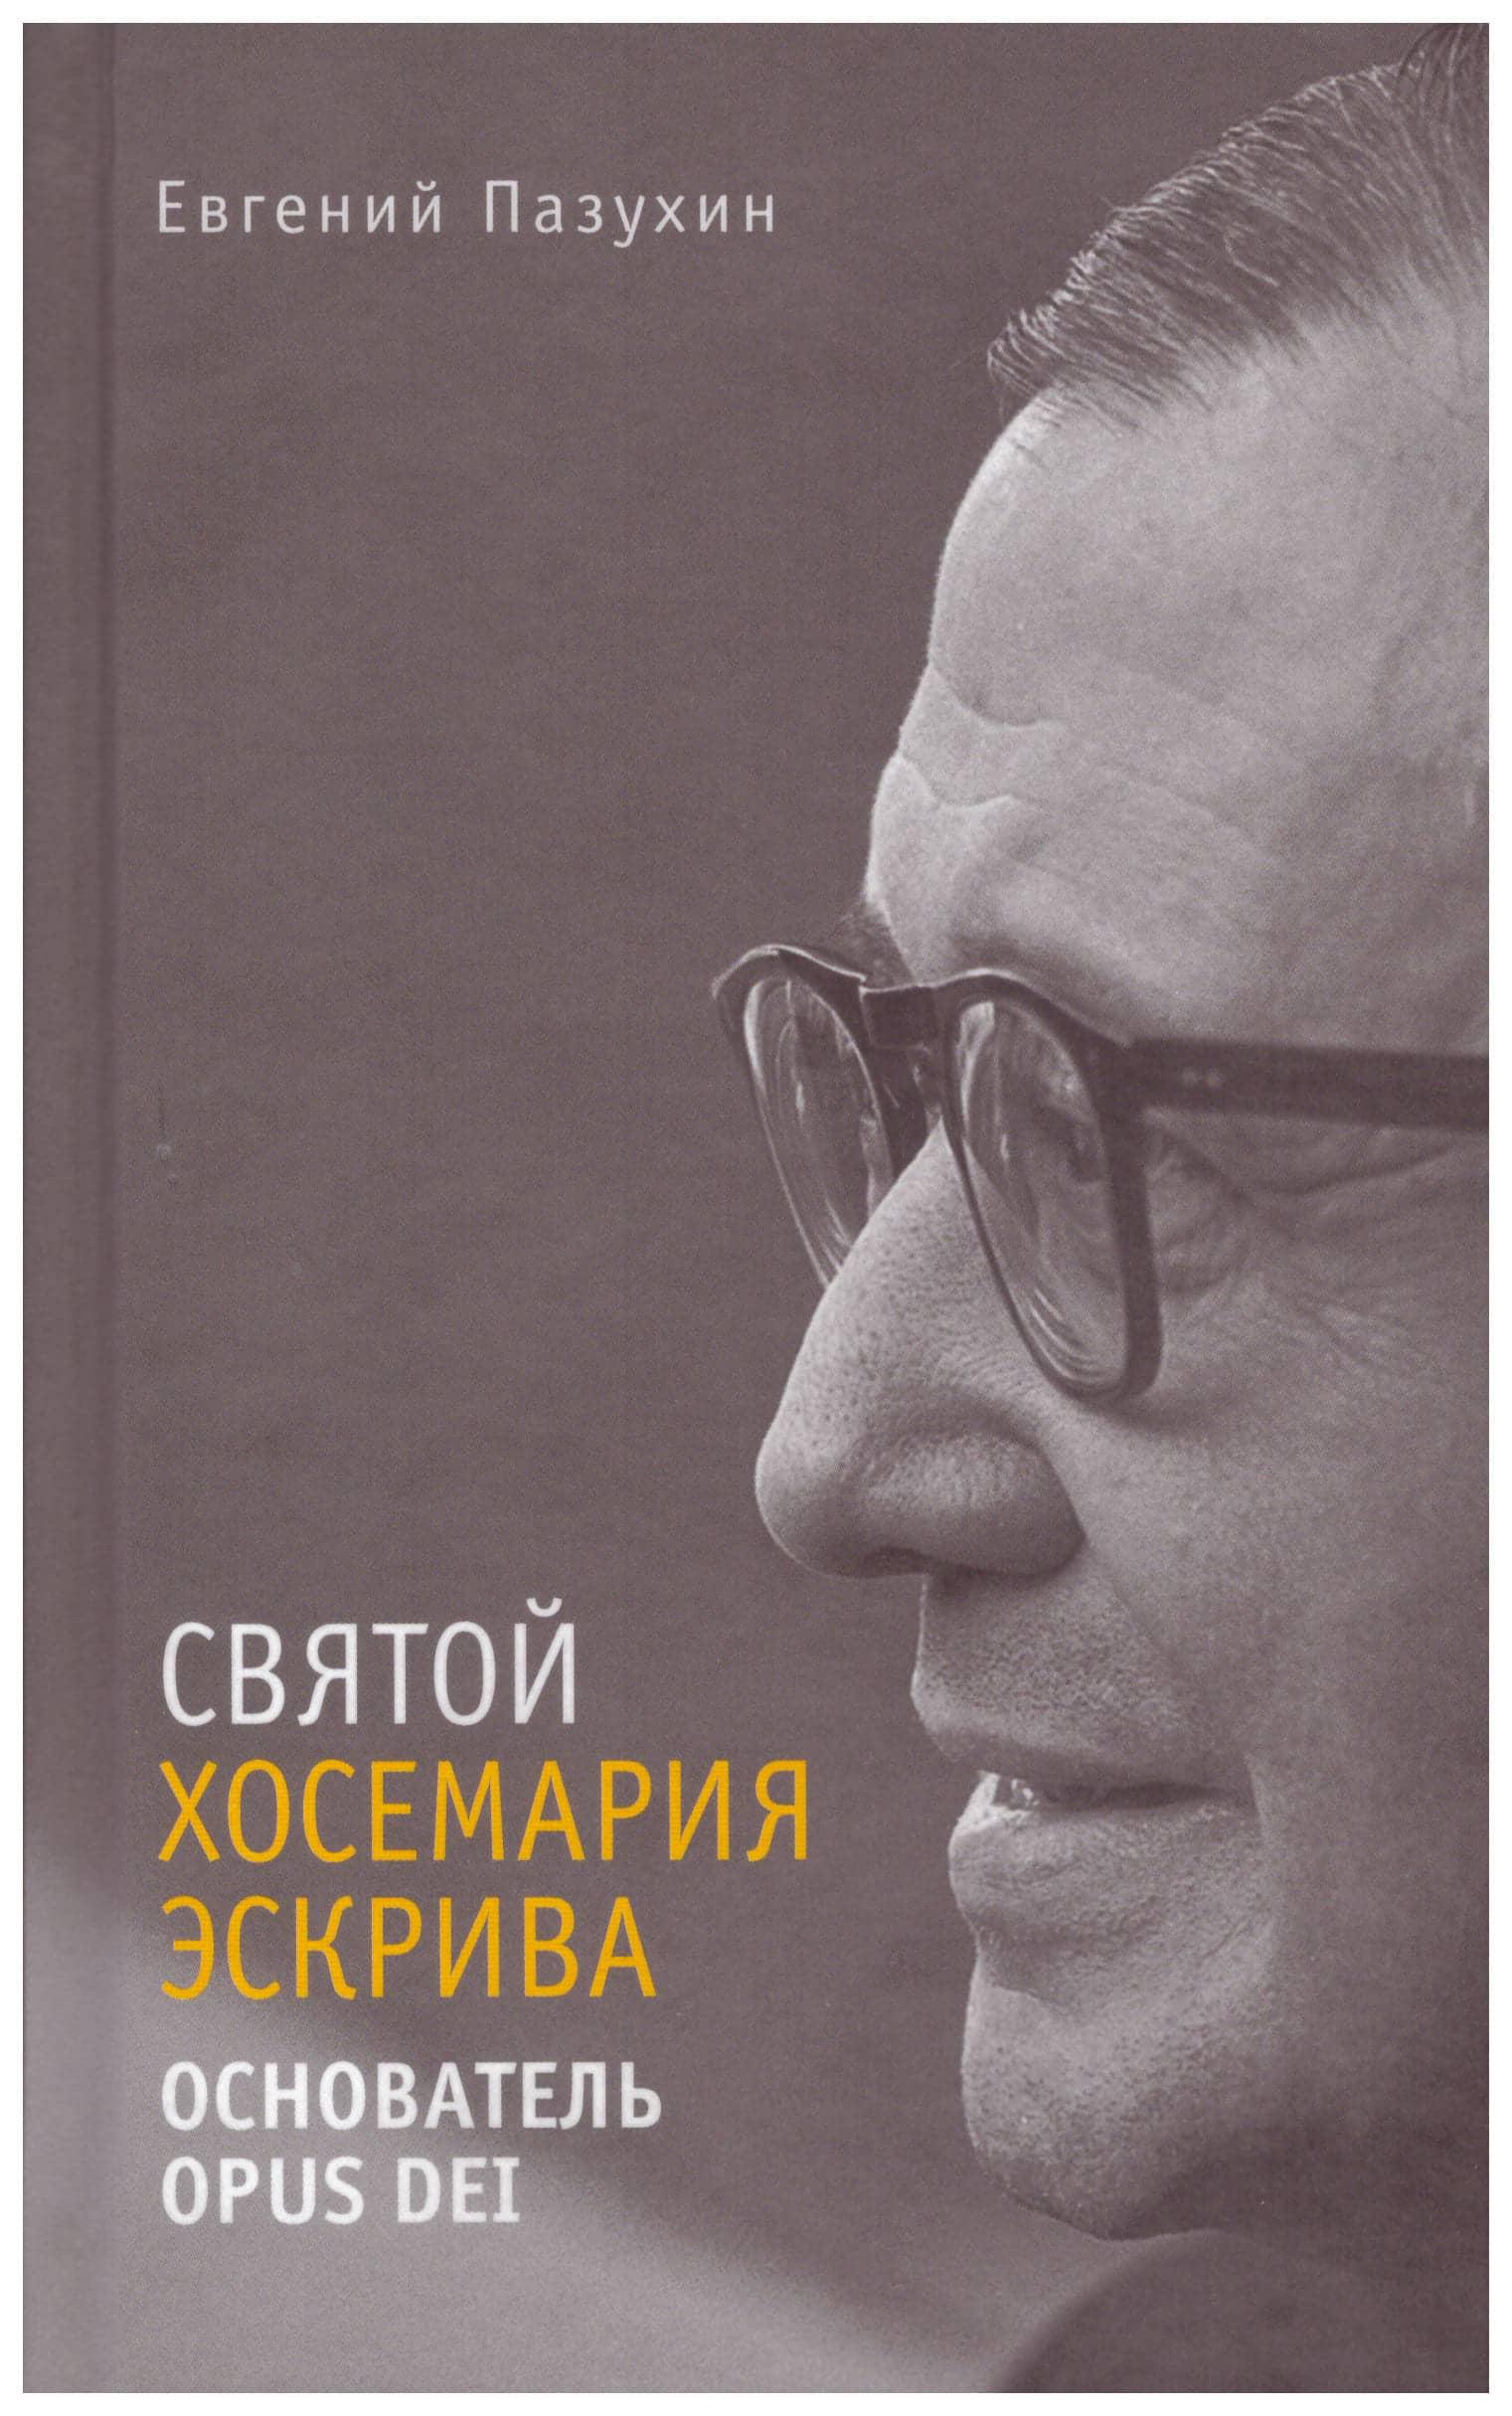 Св. Хосемария Эскрива – Основатель Opus Dei Пазухин Евгений Александрович